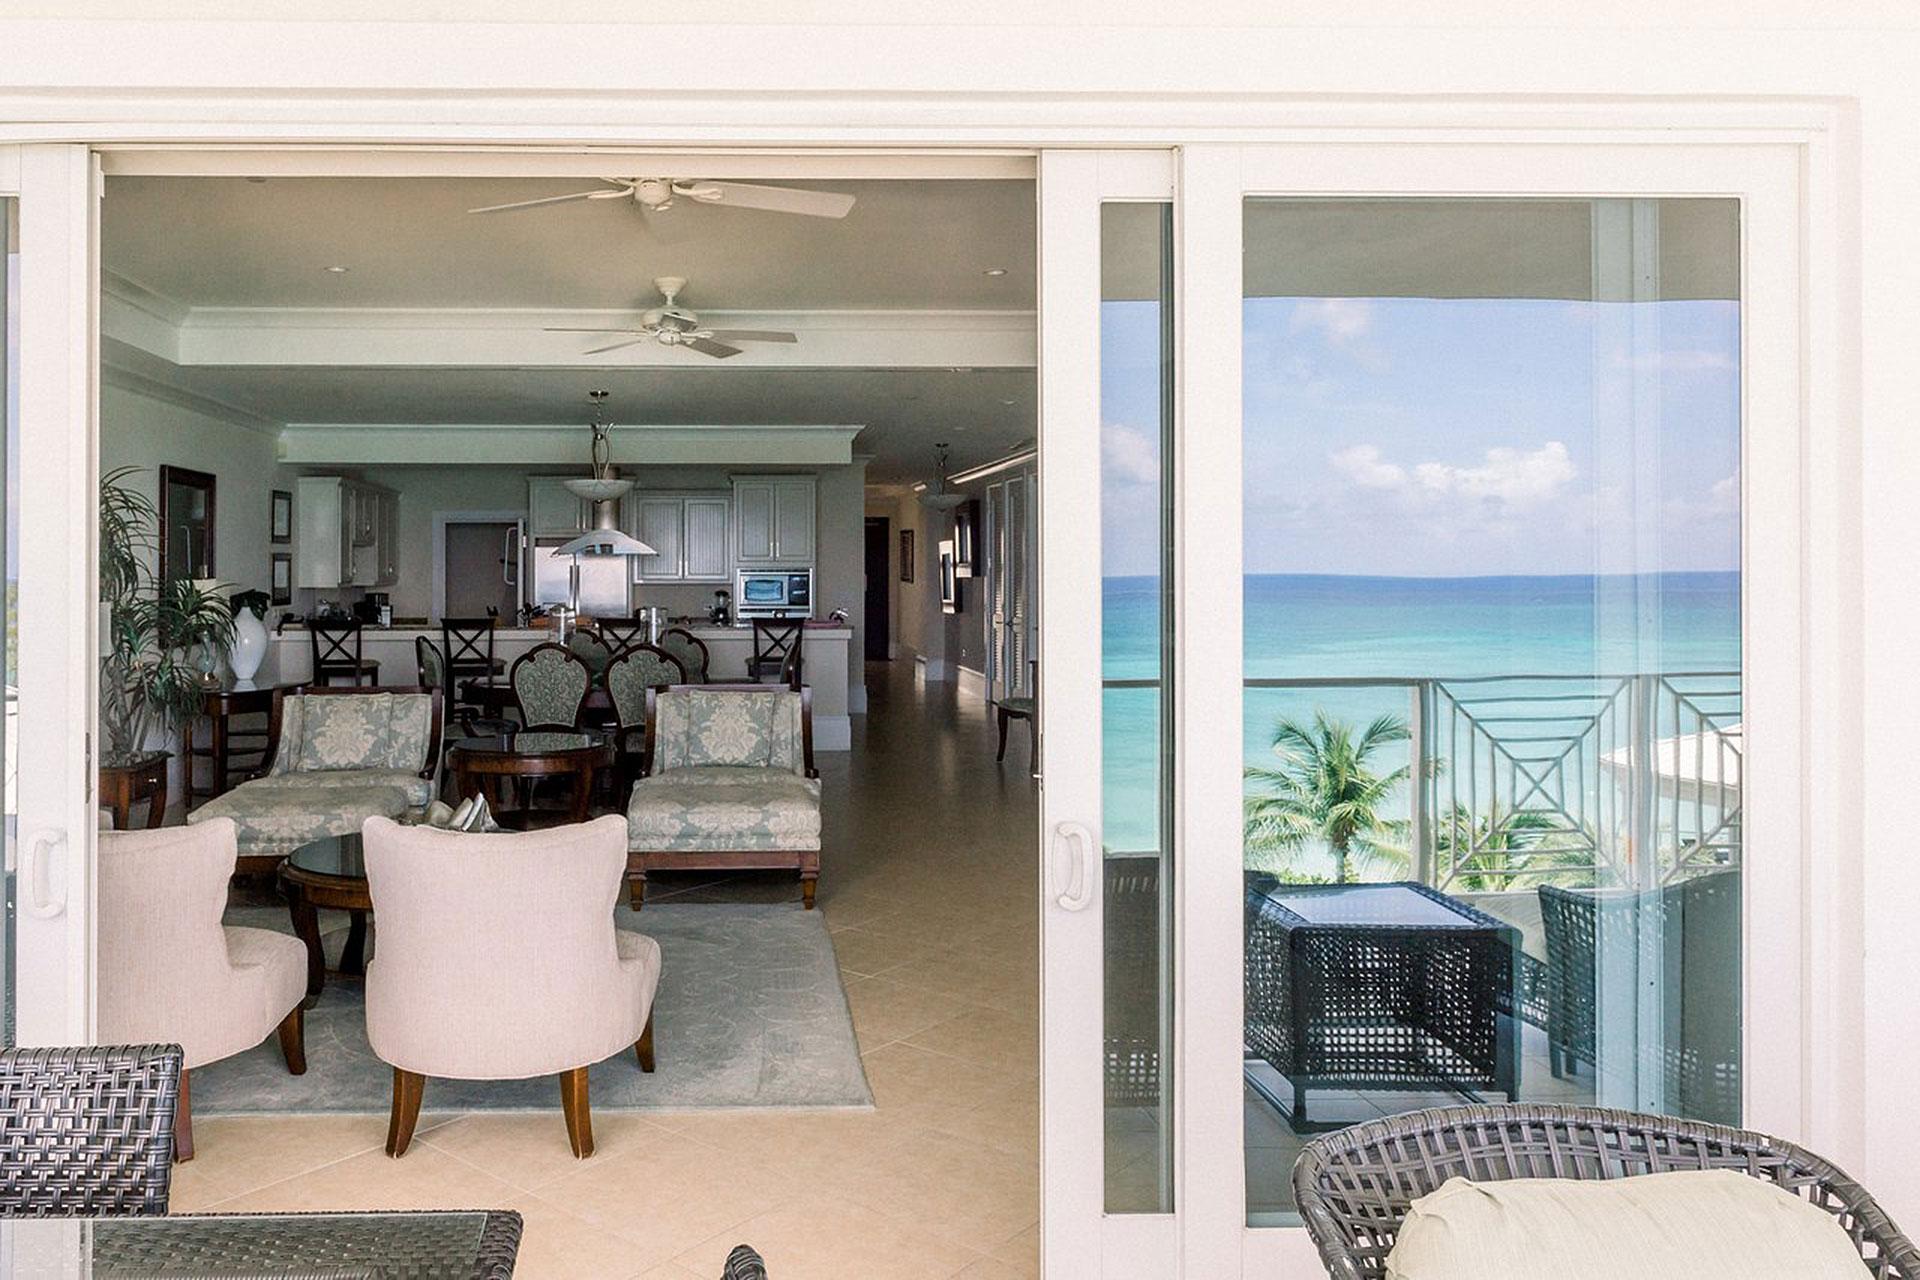 Caribbean Club Luxury Boutique Hotel in Grand Cayman; Courtesy of Caribbean Club Luxury Boutique Hotel